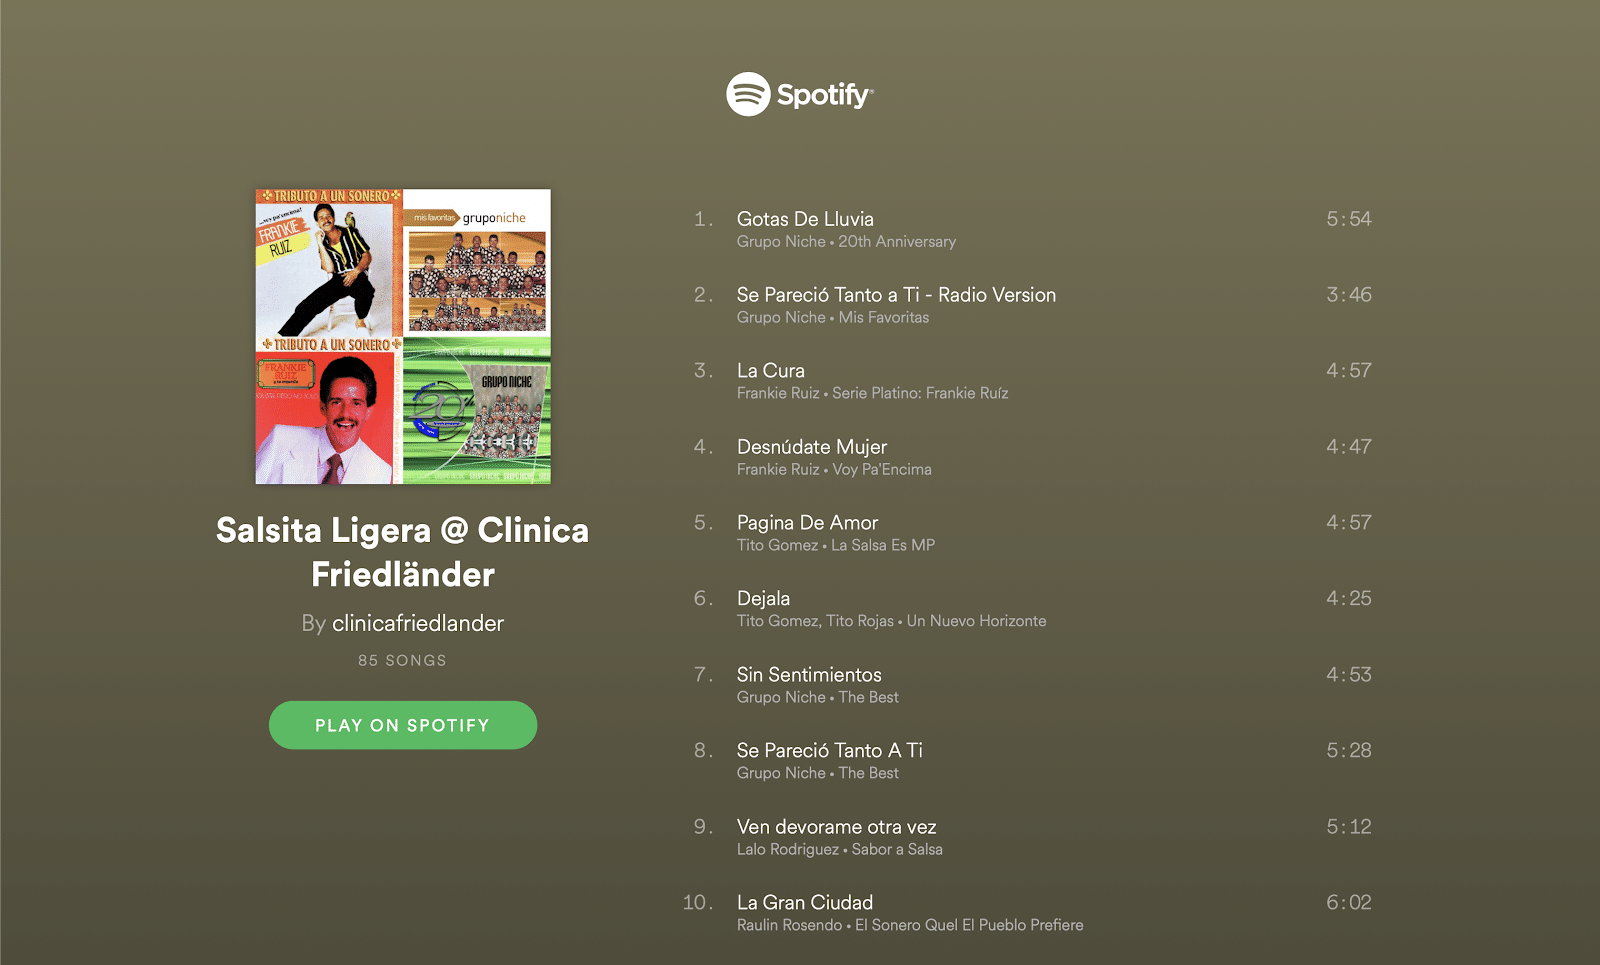 Nuestras PlayLists favoritas en Spotify  @clinicafriedlander 4